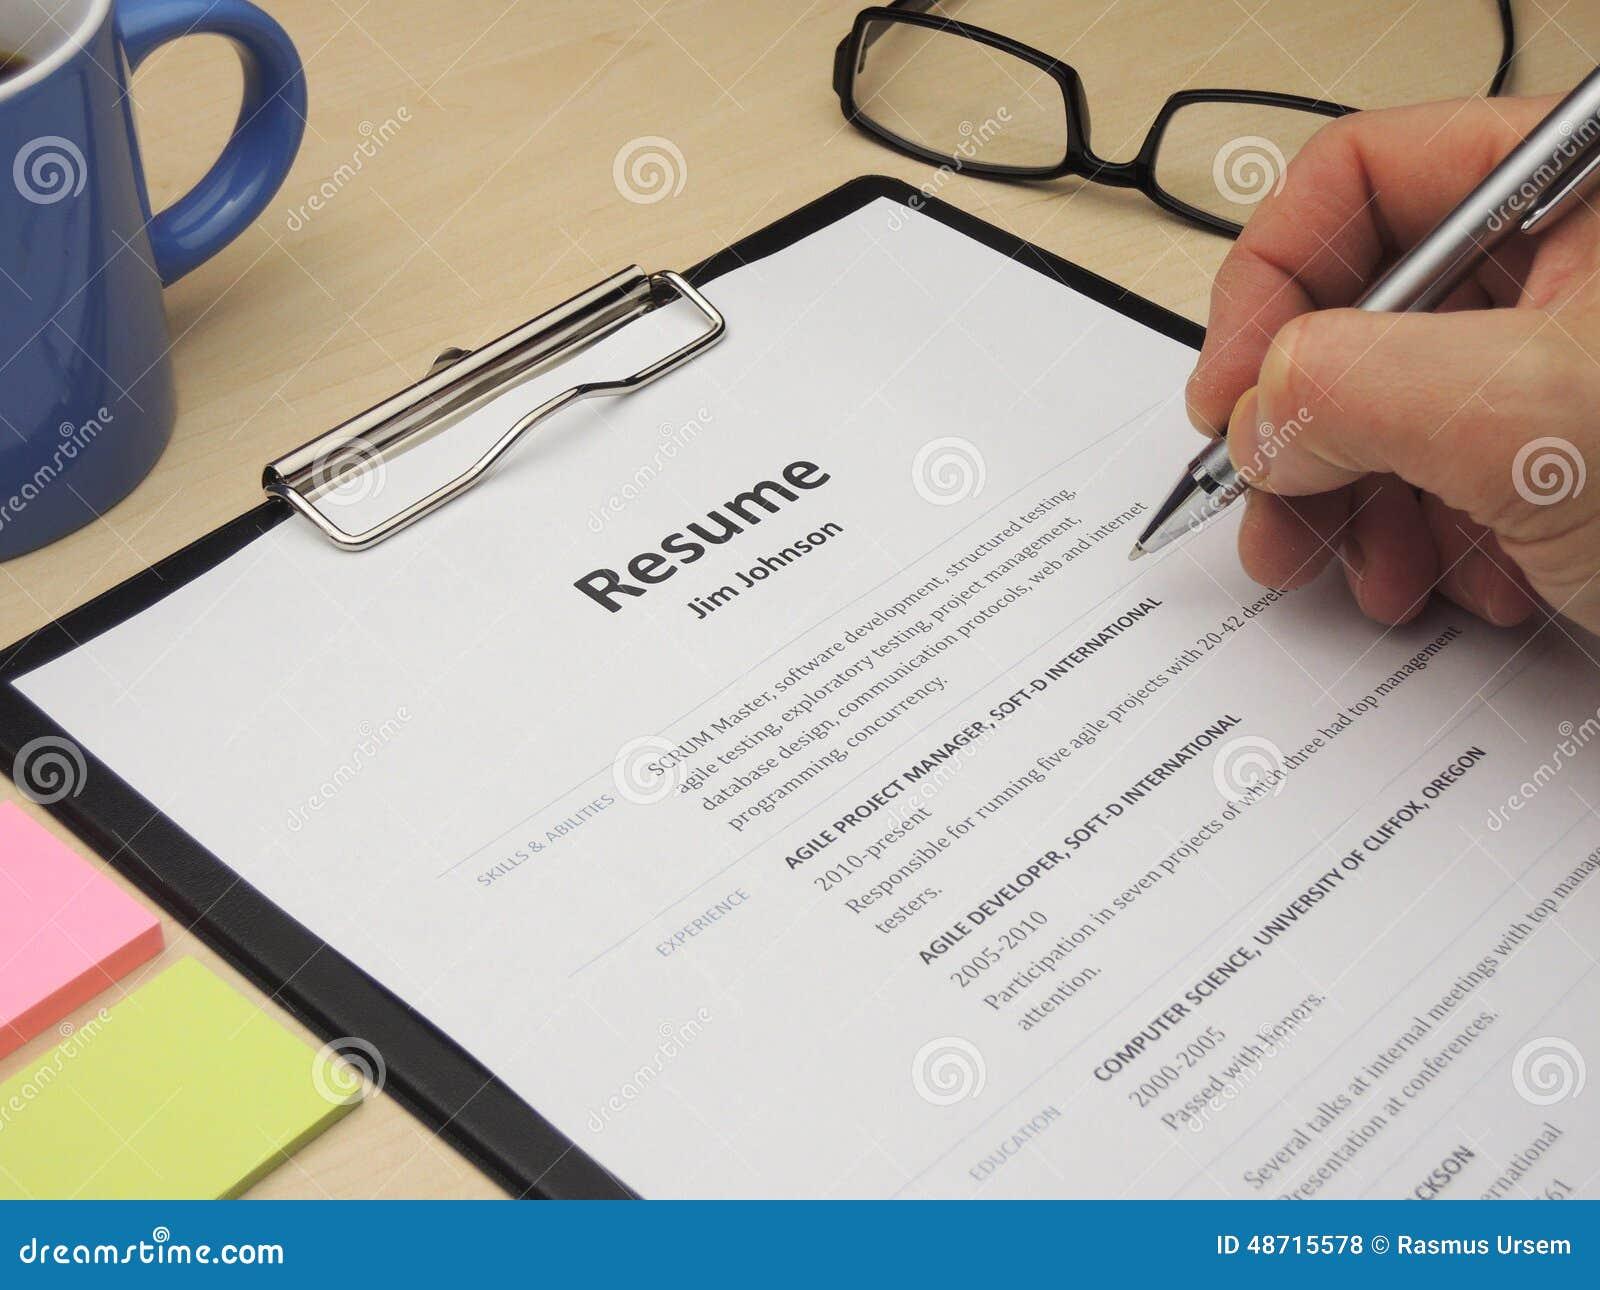 Curriculum vitae foto de archivo. Imagen de resume, negocios - 48715578